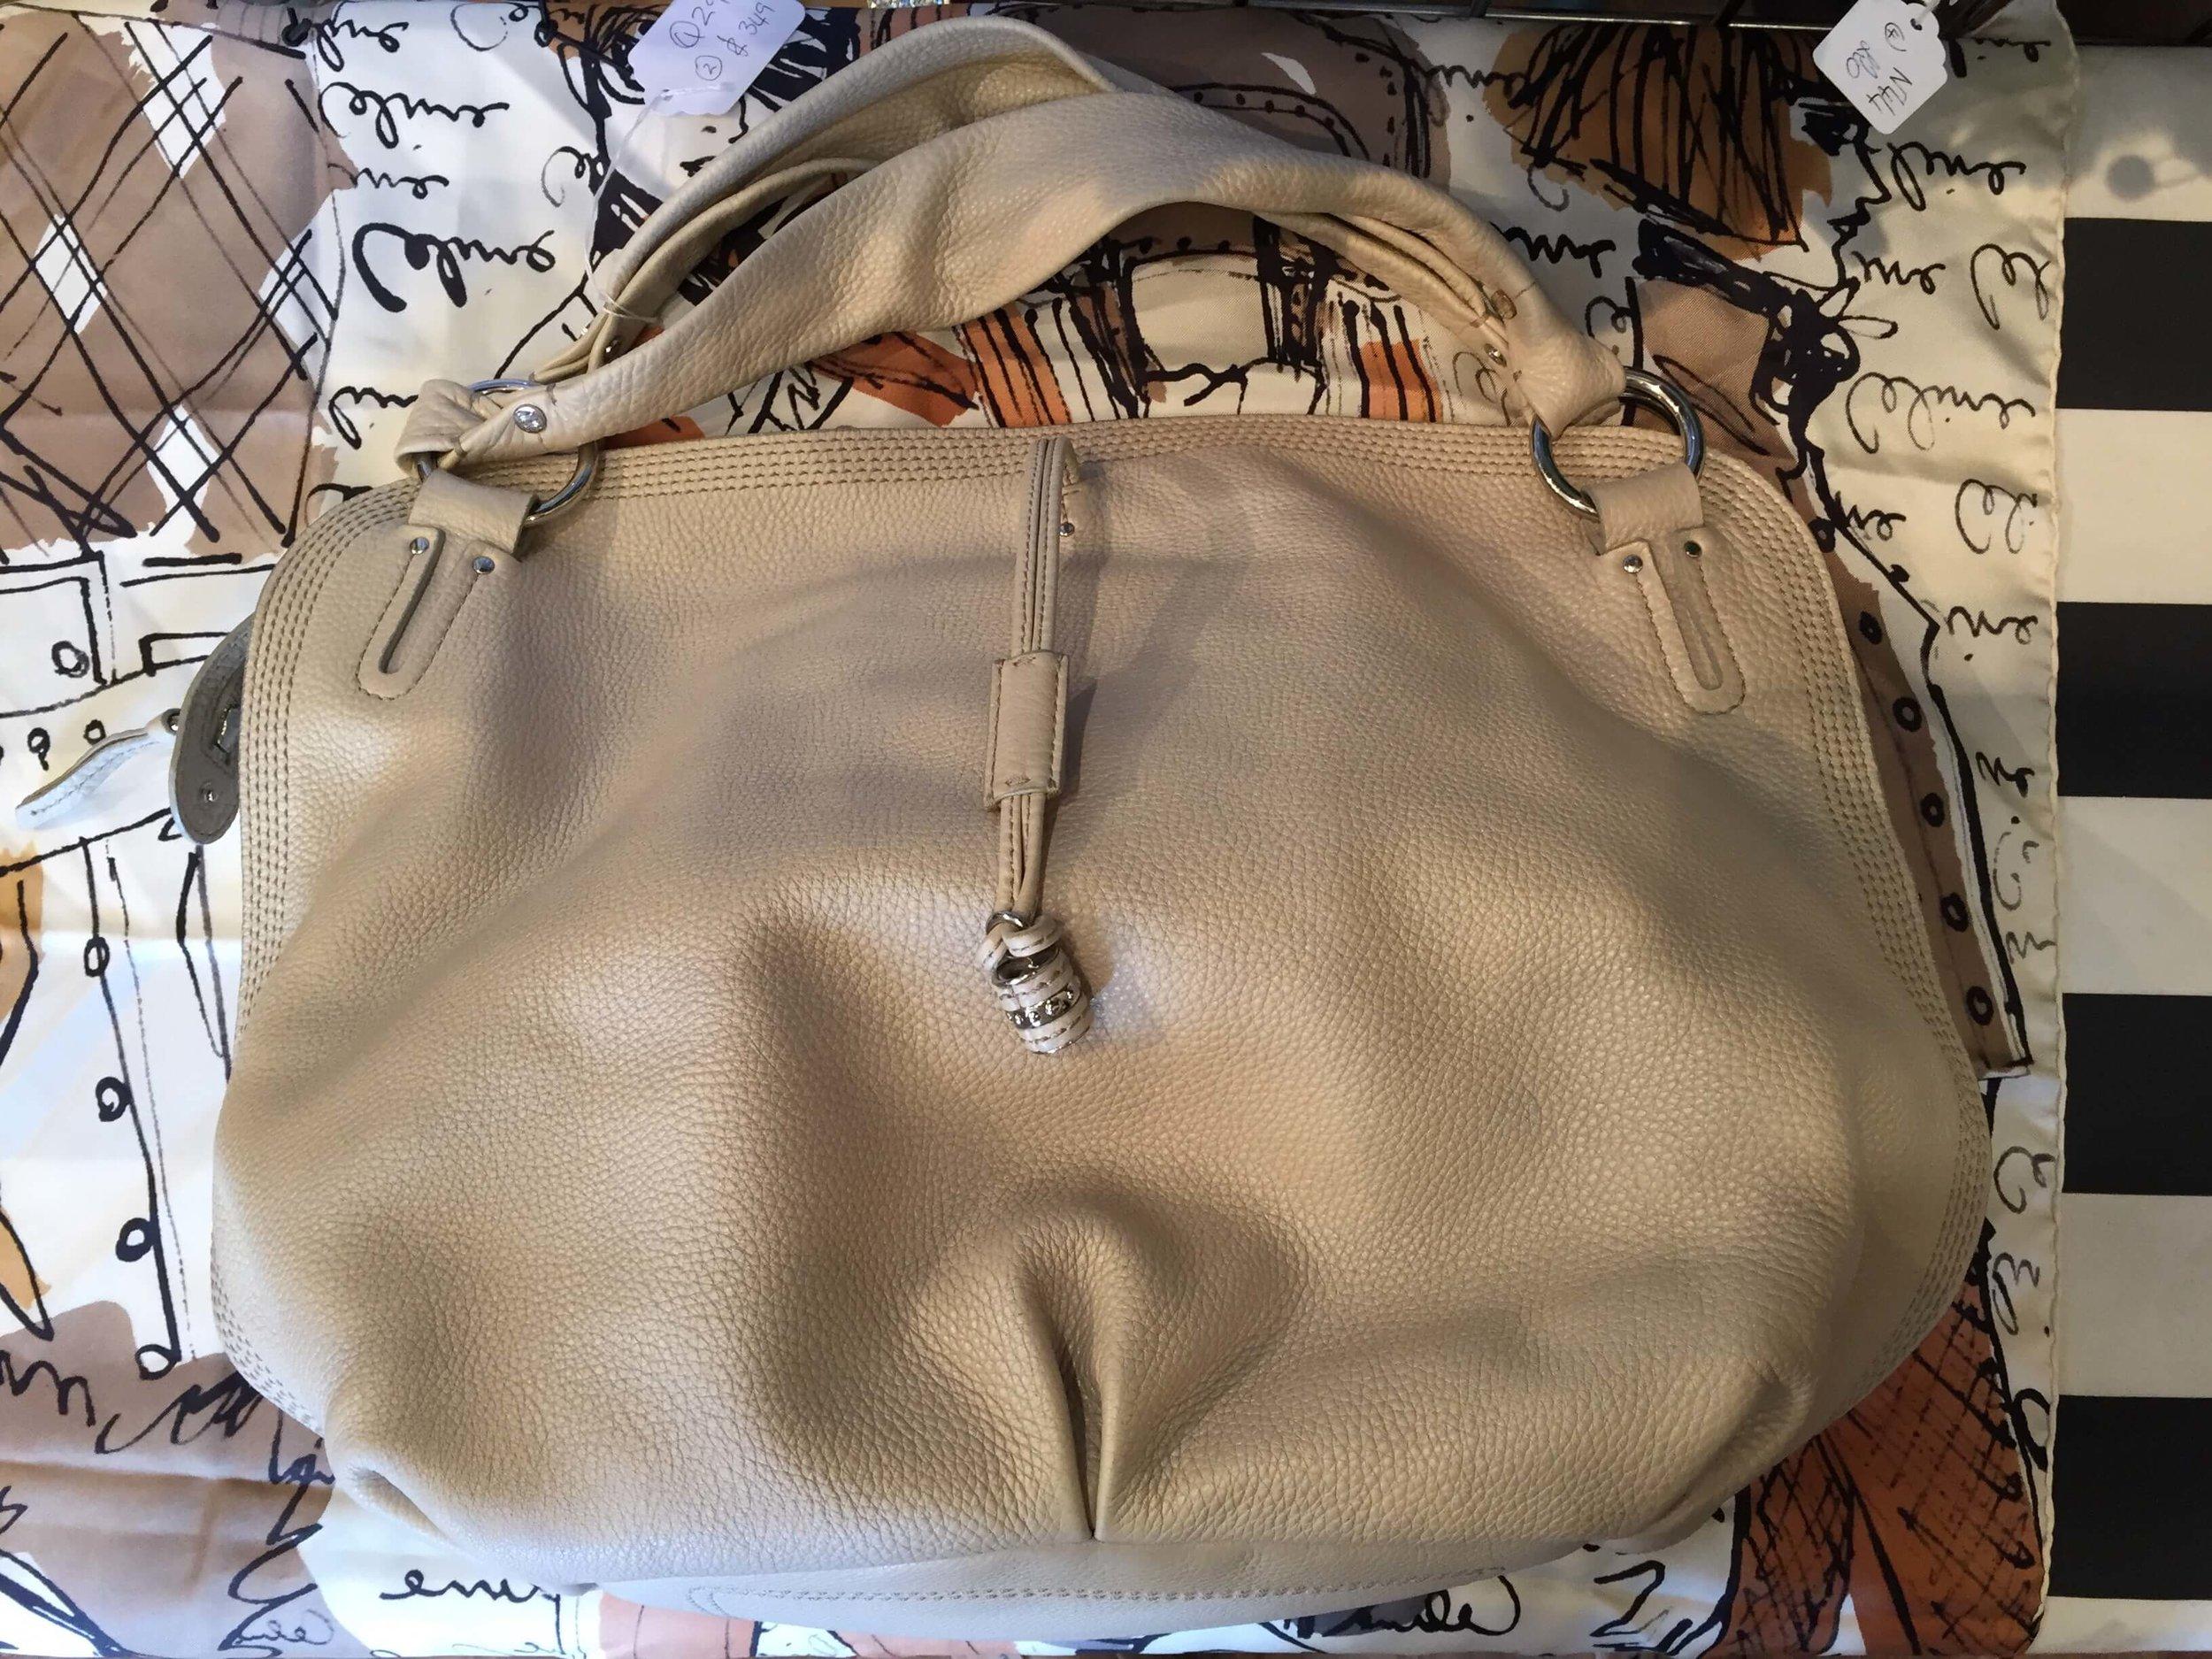 Celine pearl hobo stone colour bag £349 (1).jpg